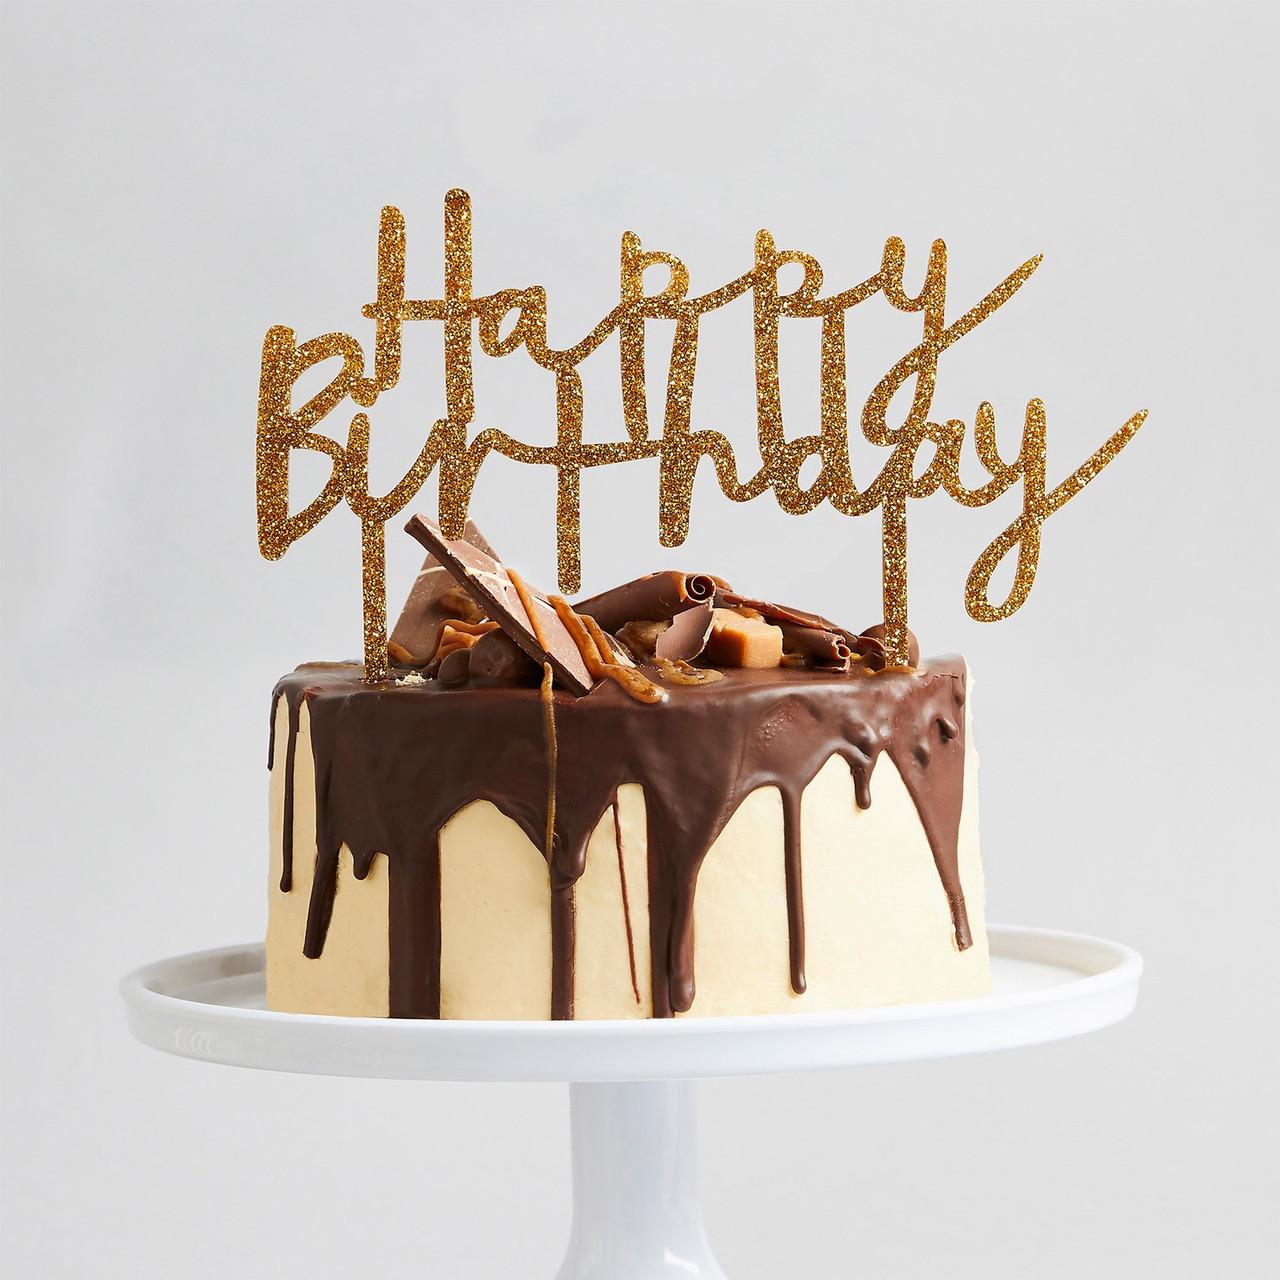 Outstanding Gold Glitter Happy Birthday Cake Topper Funny Birthday Cards Online Aeocydamsfinfo